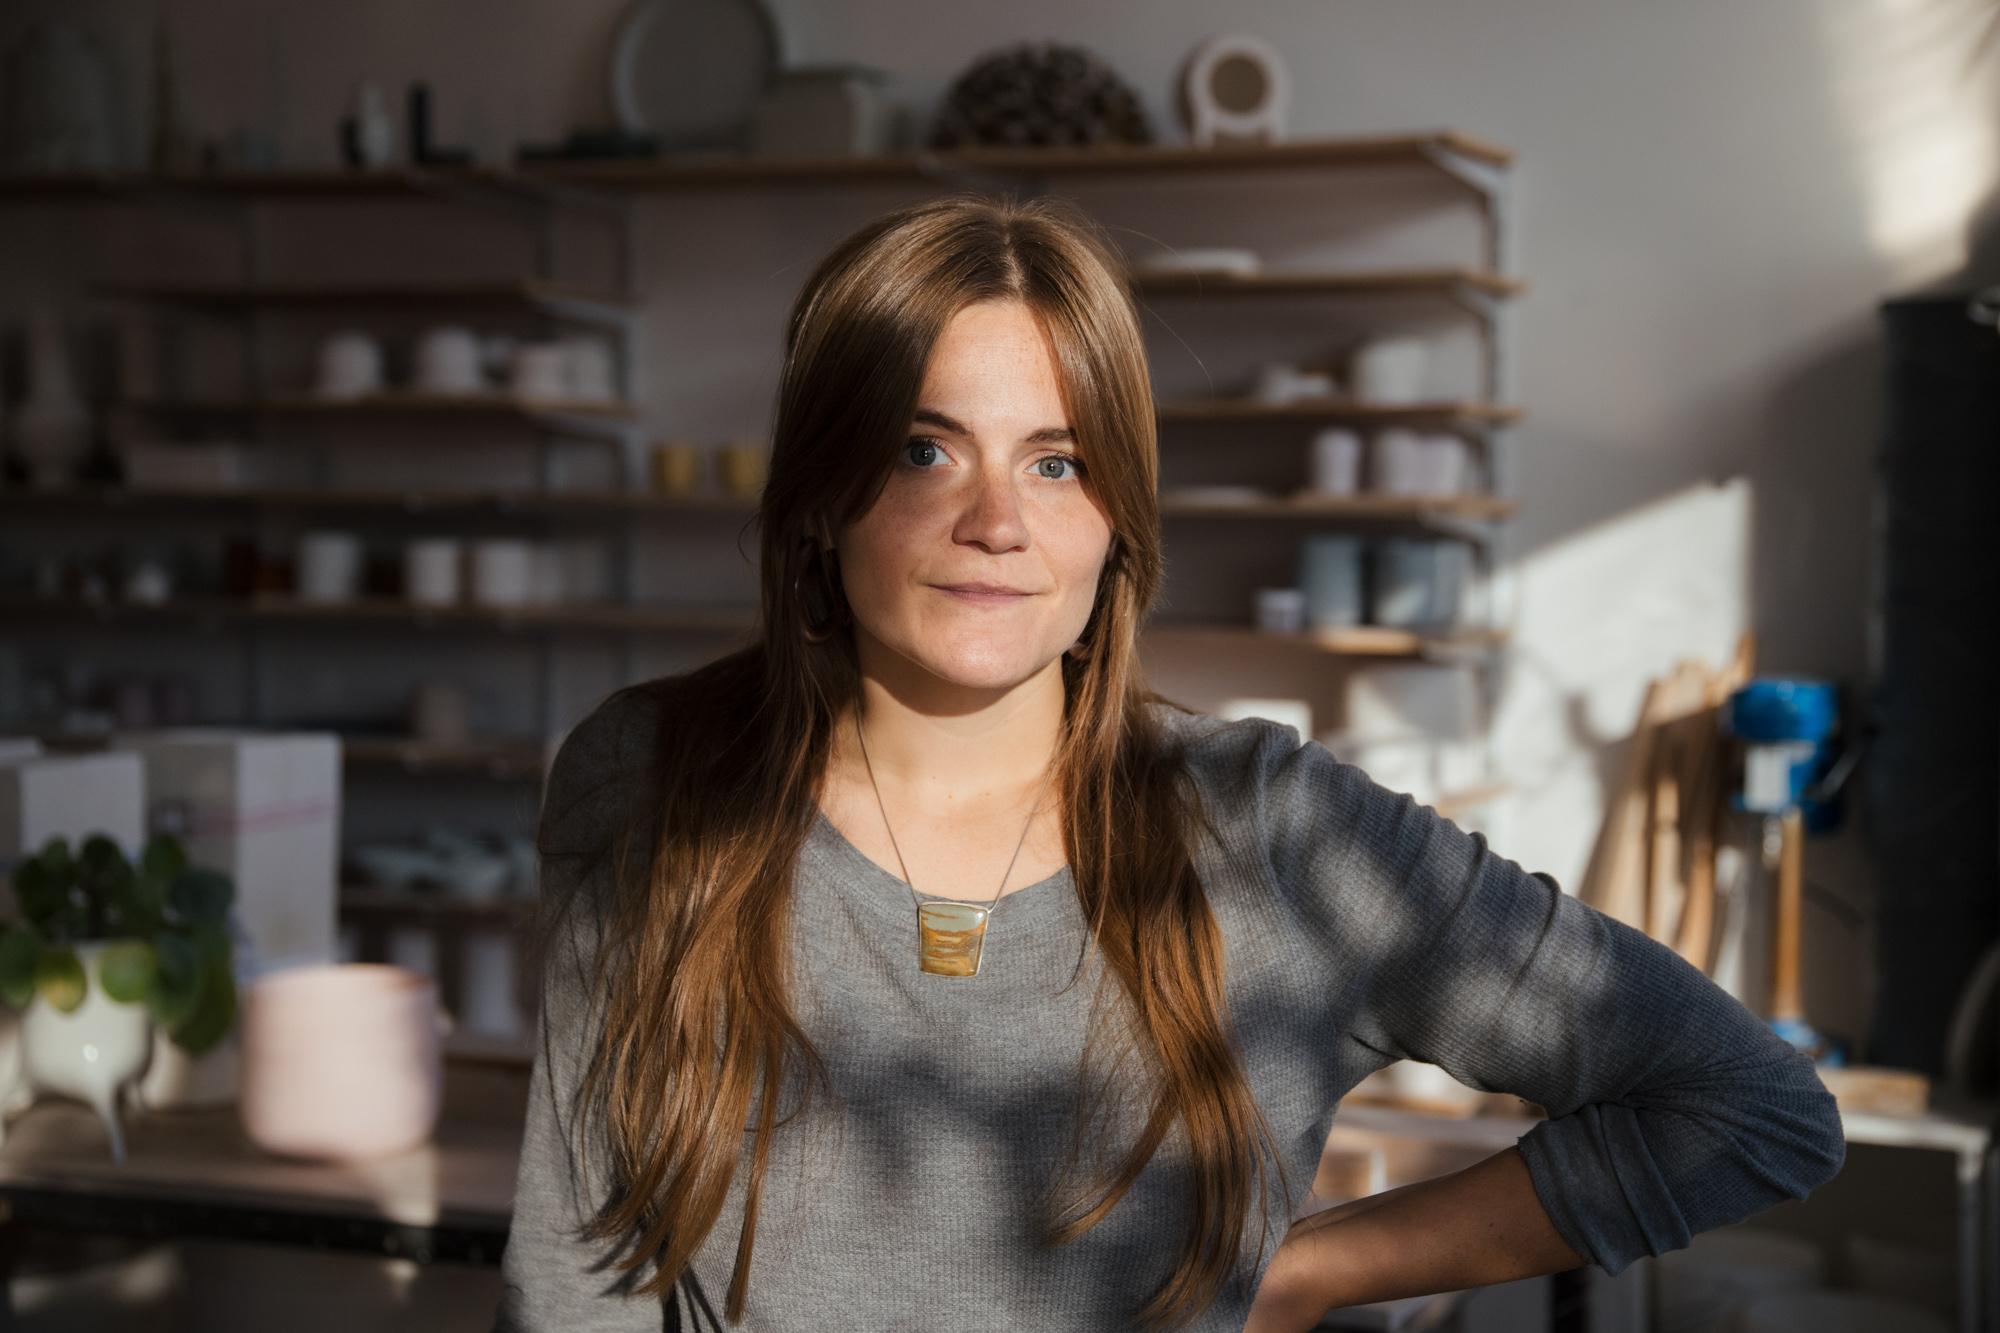 Erin Rae (by Matthijs van der Ven for theinfluences.com)